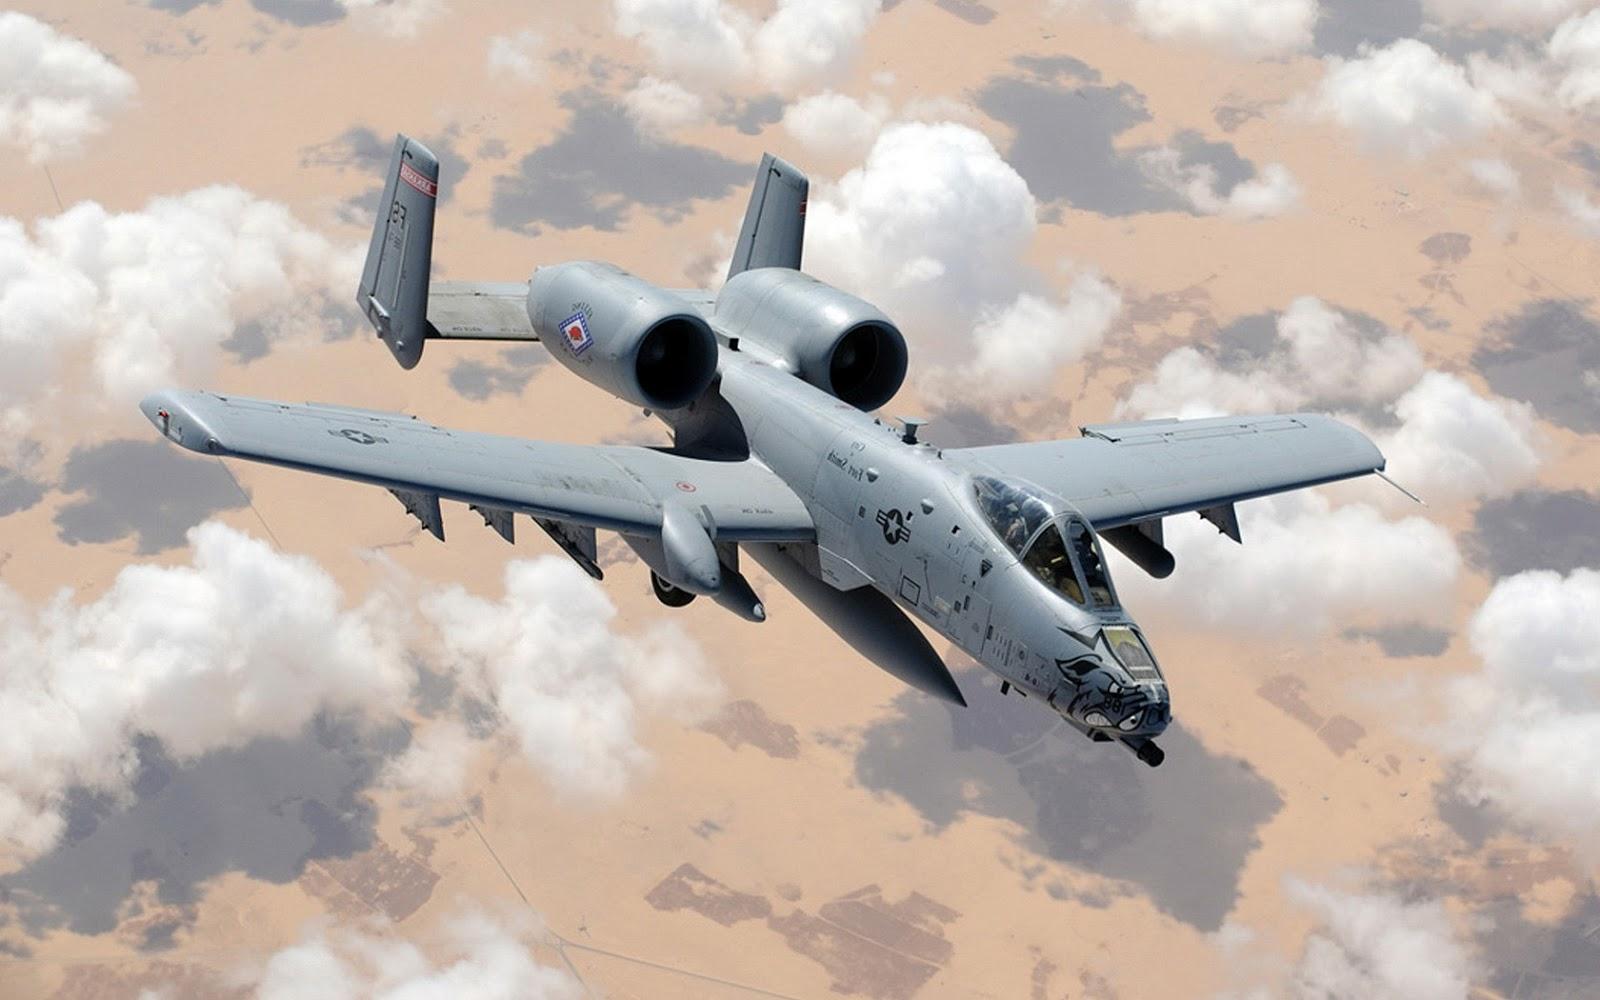 http://2.bp.blogspot.com/-0HKOeyAUtDY/UQqpWrfJBXI/AAAAAAAAMNg/K1aOb1QauIA/s1600/vliegtuig-a-10-thunderbolt-II-wallpaper.jpg